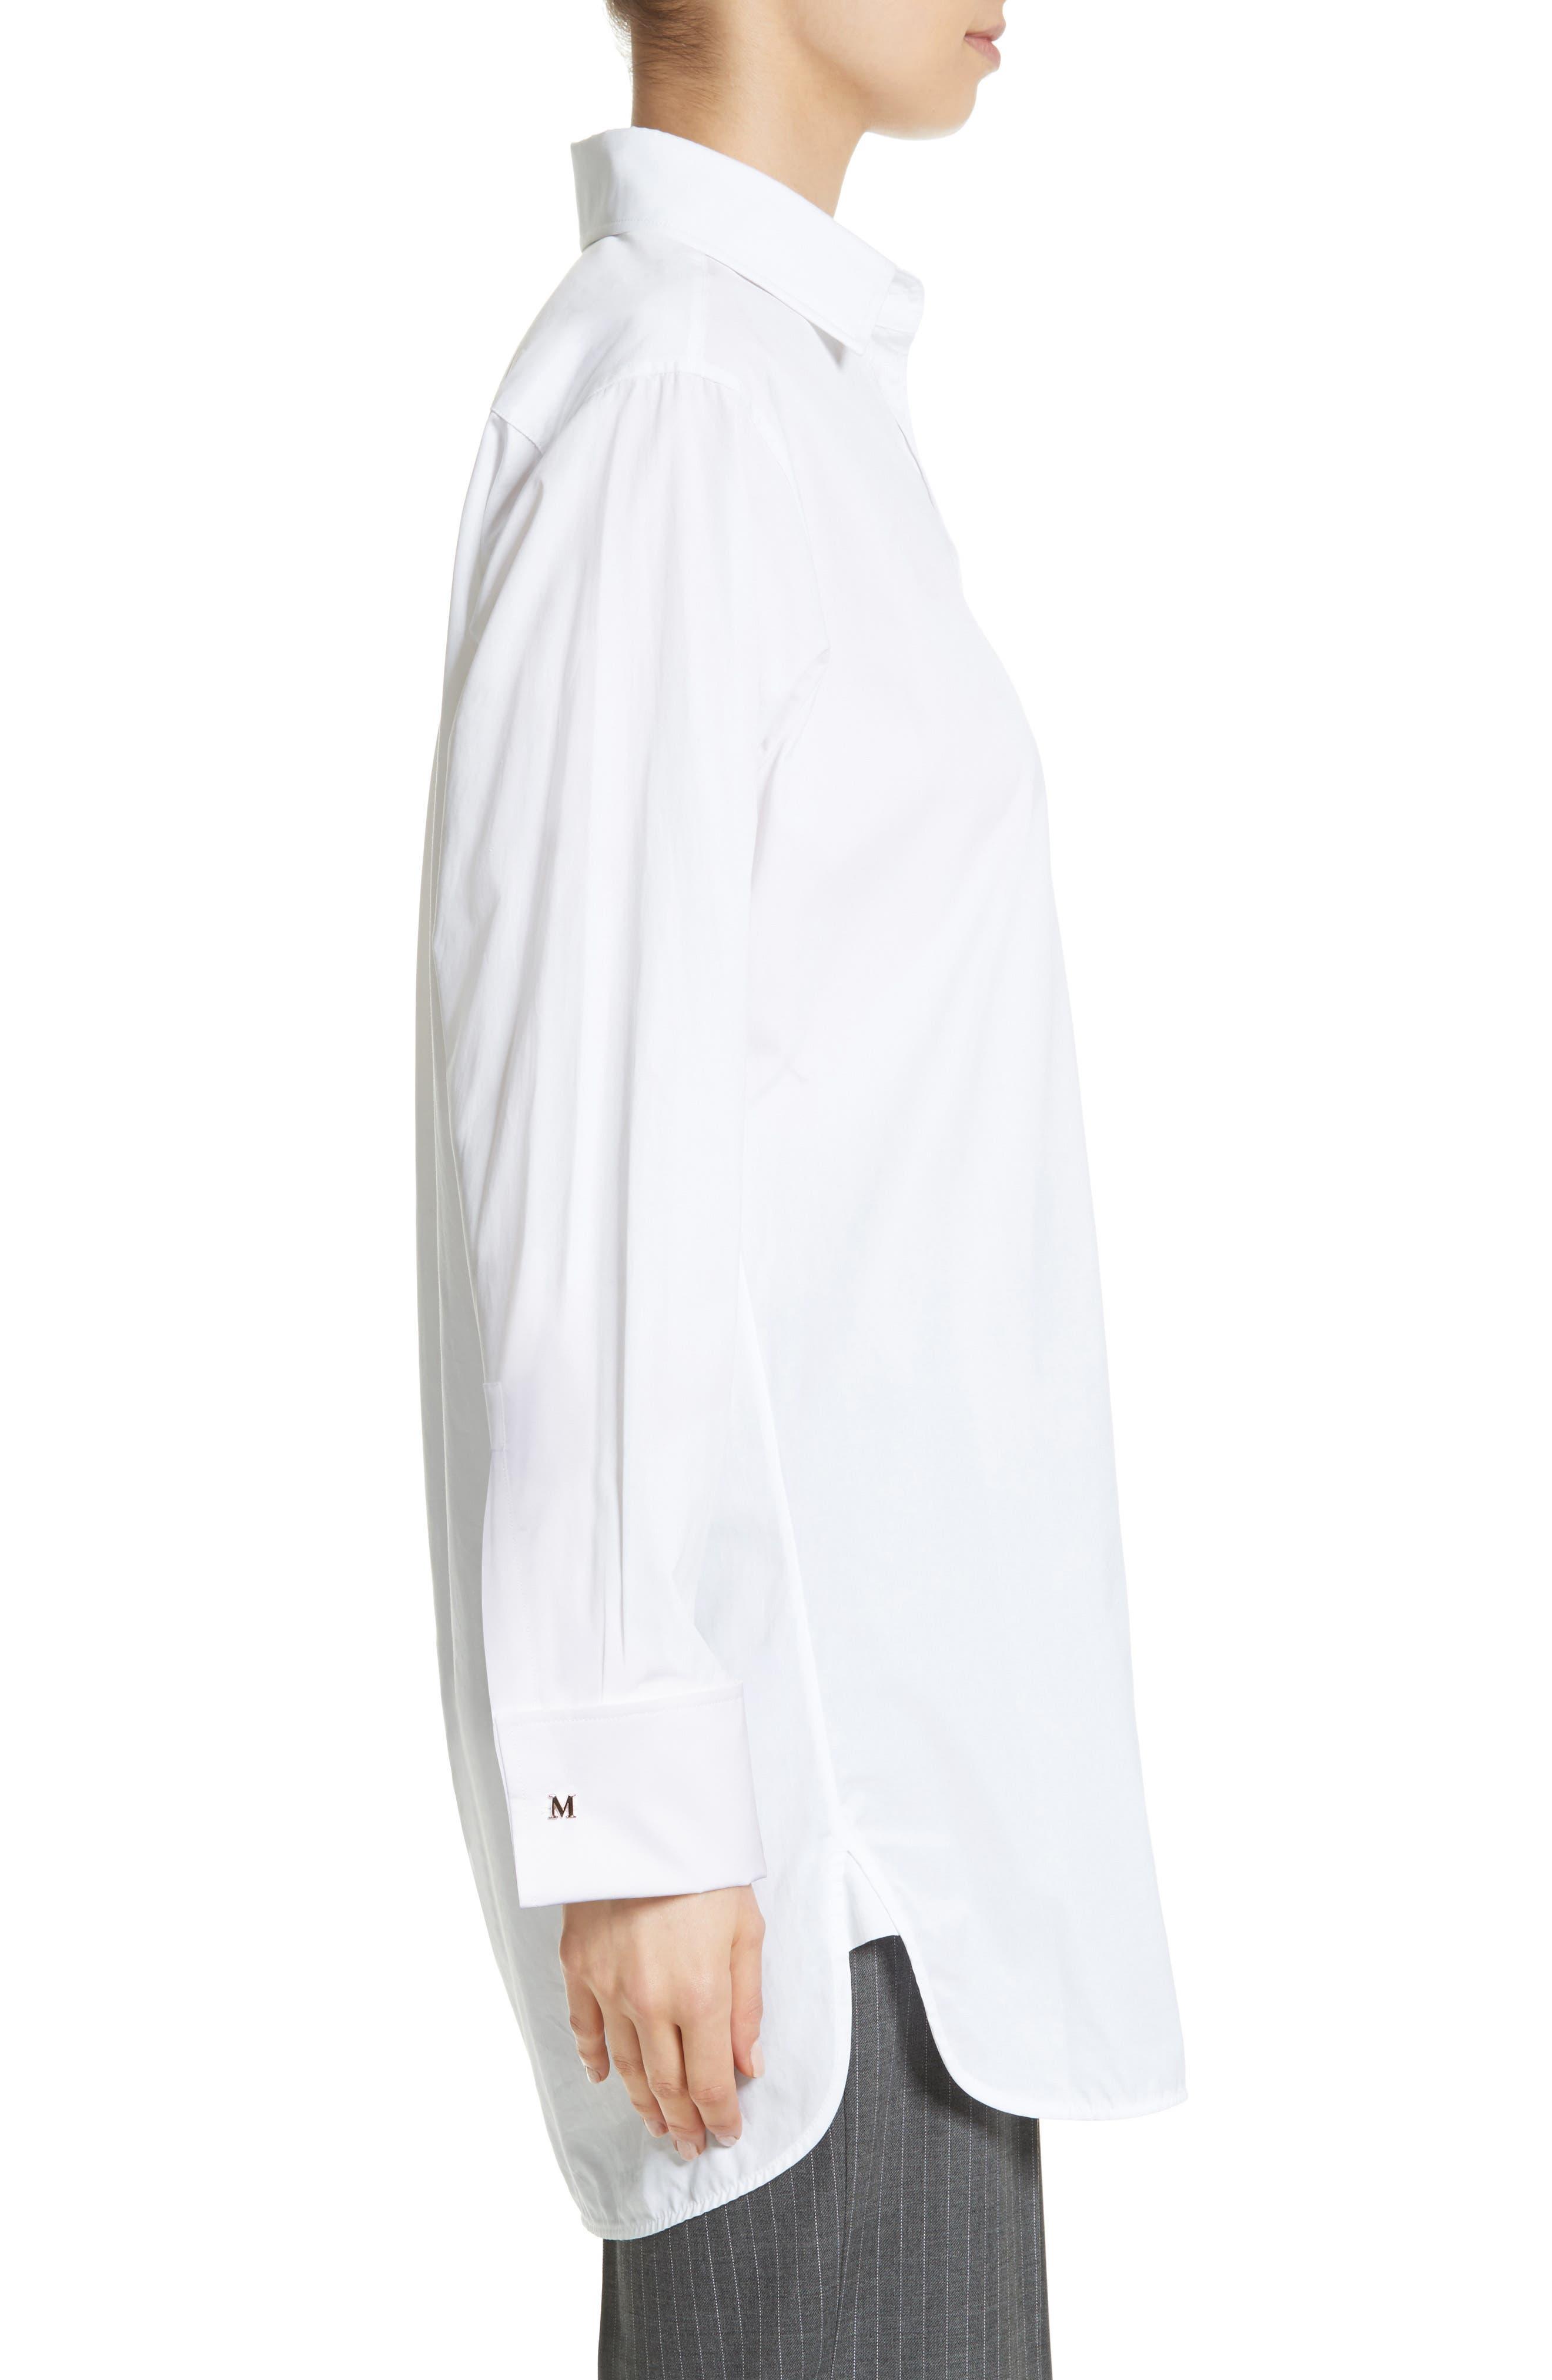 Visivo Cotton Poplin Shirt,                             Alternate thumbnail 3, color,                             101